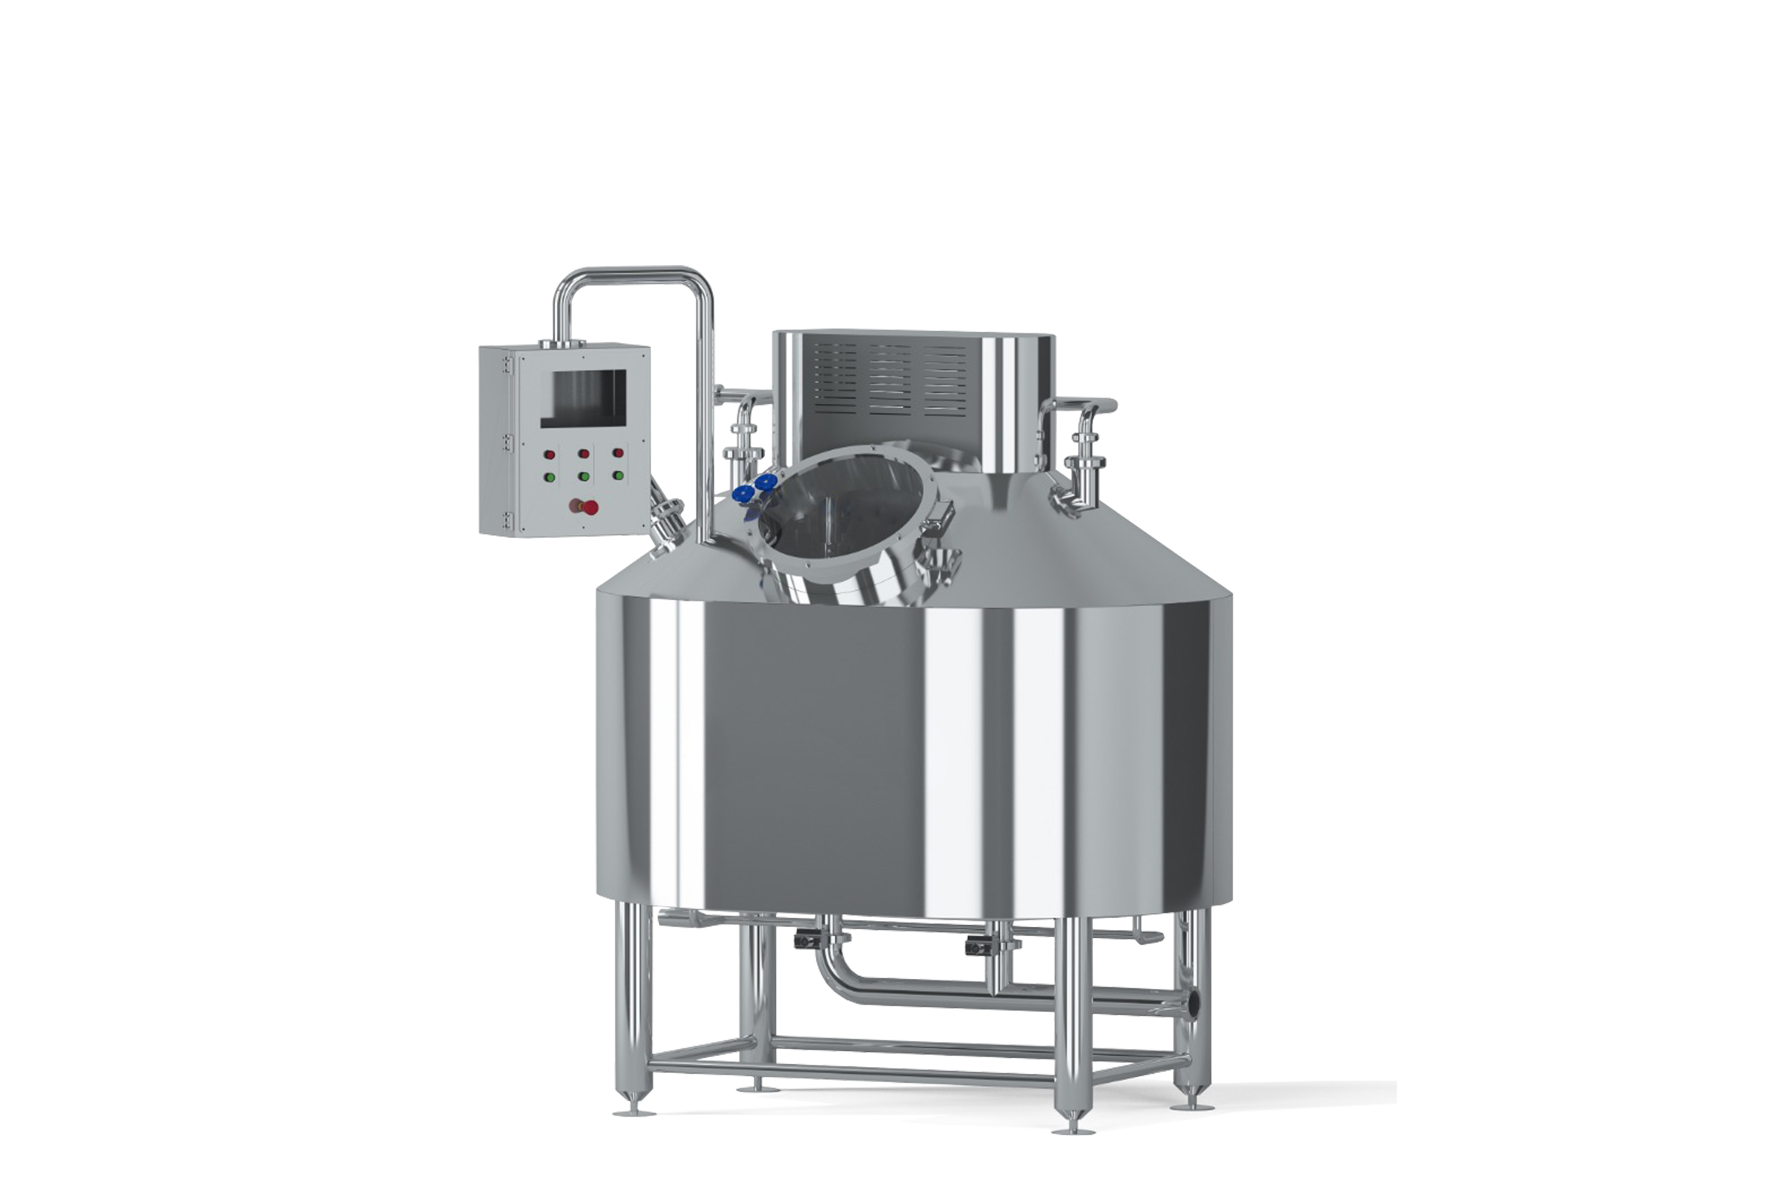 Equipamento de Processo - Quijomatic - Aço Inox